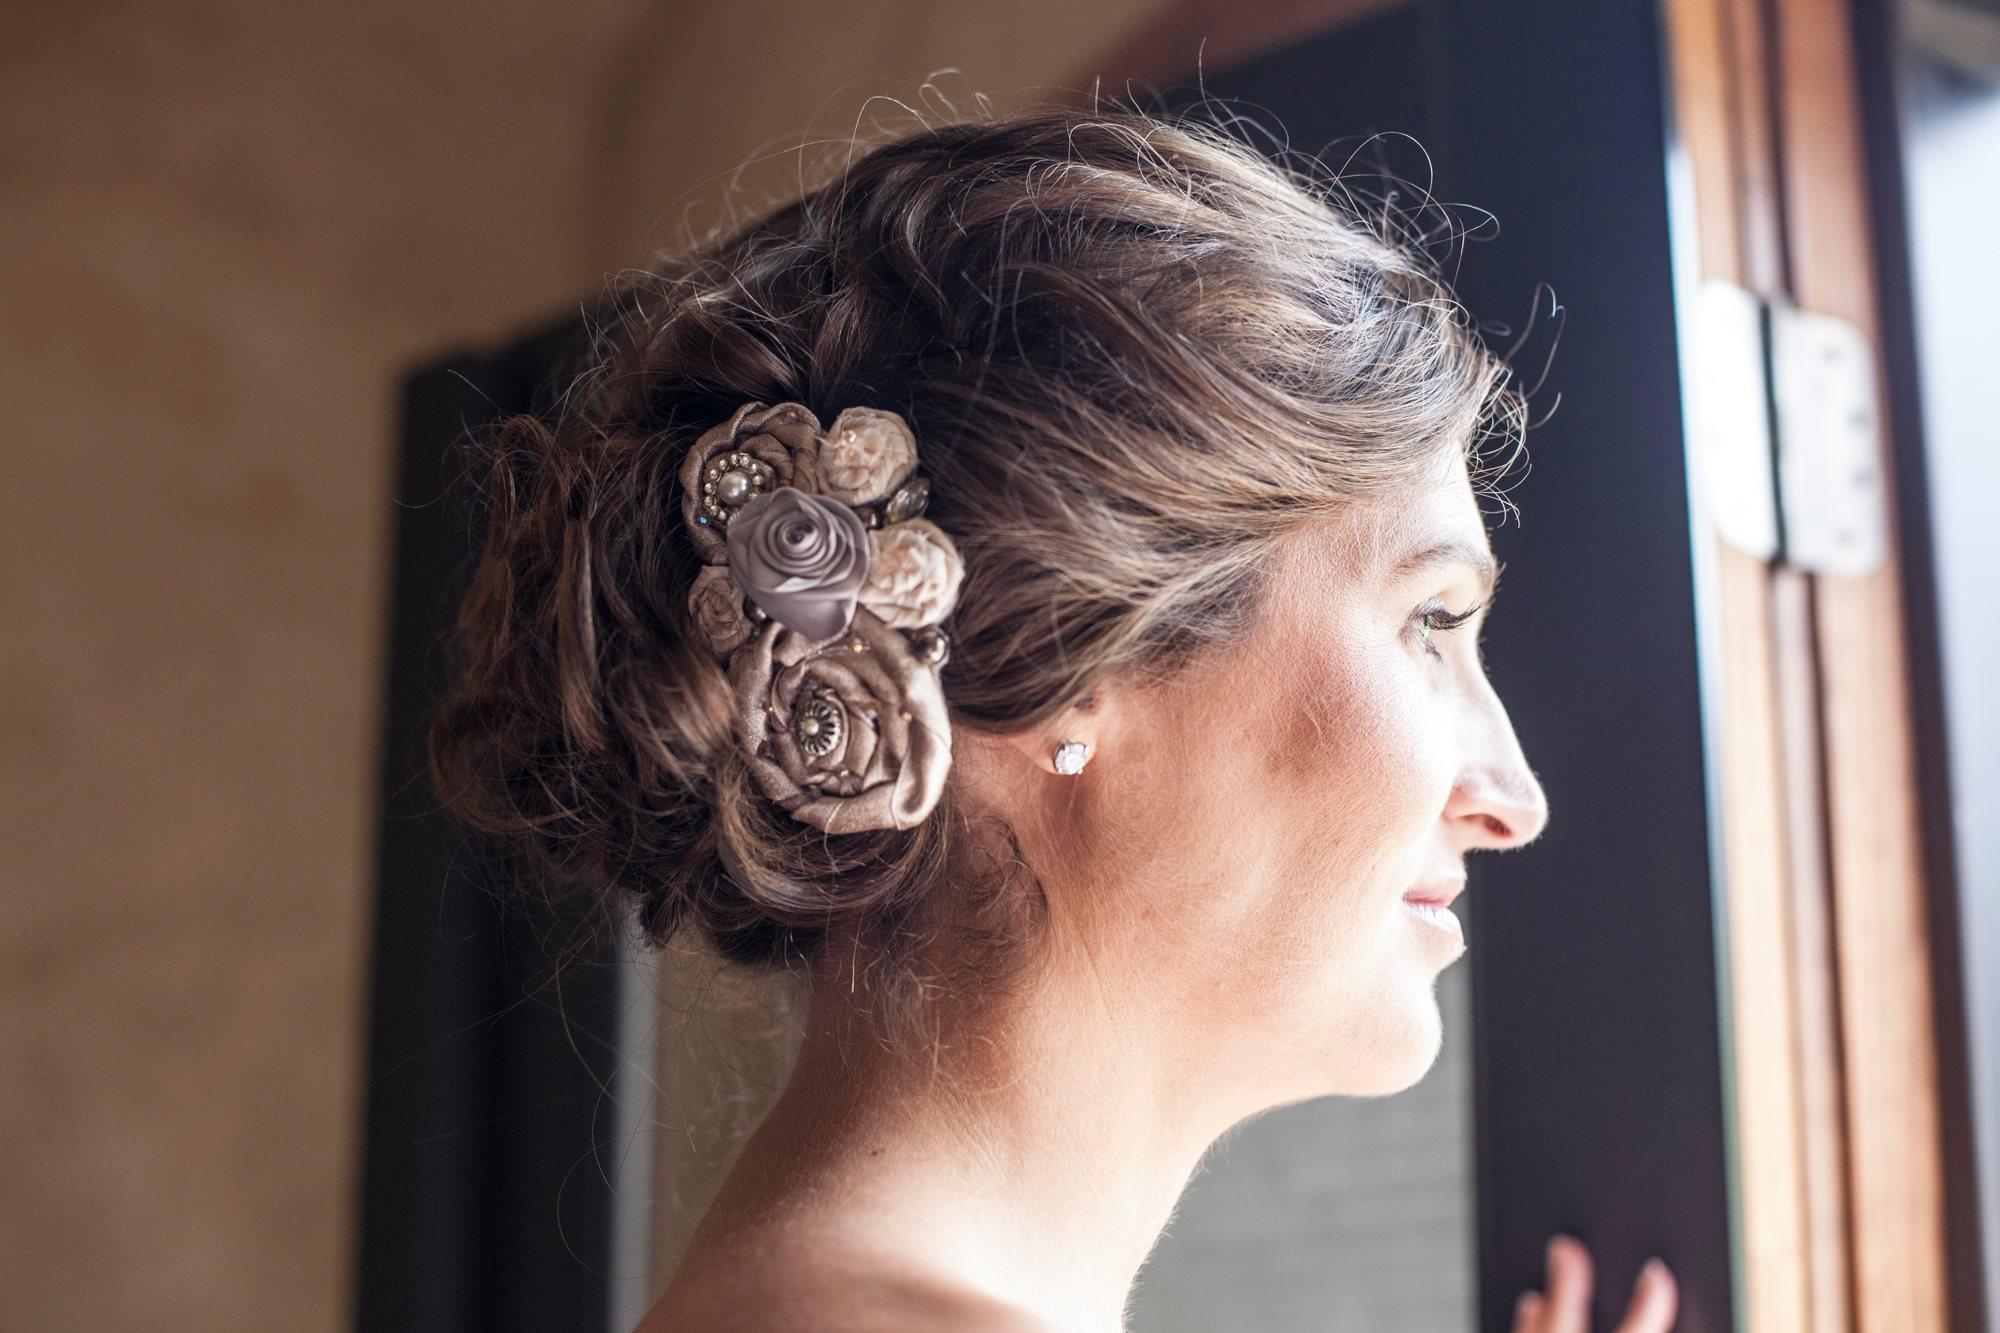 vintage-bridal-hair-accessory-rosettes-pin-tuck-curls-wedding-painter-ben-keys